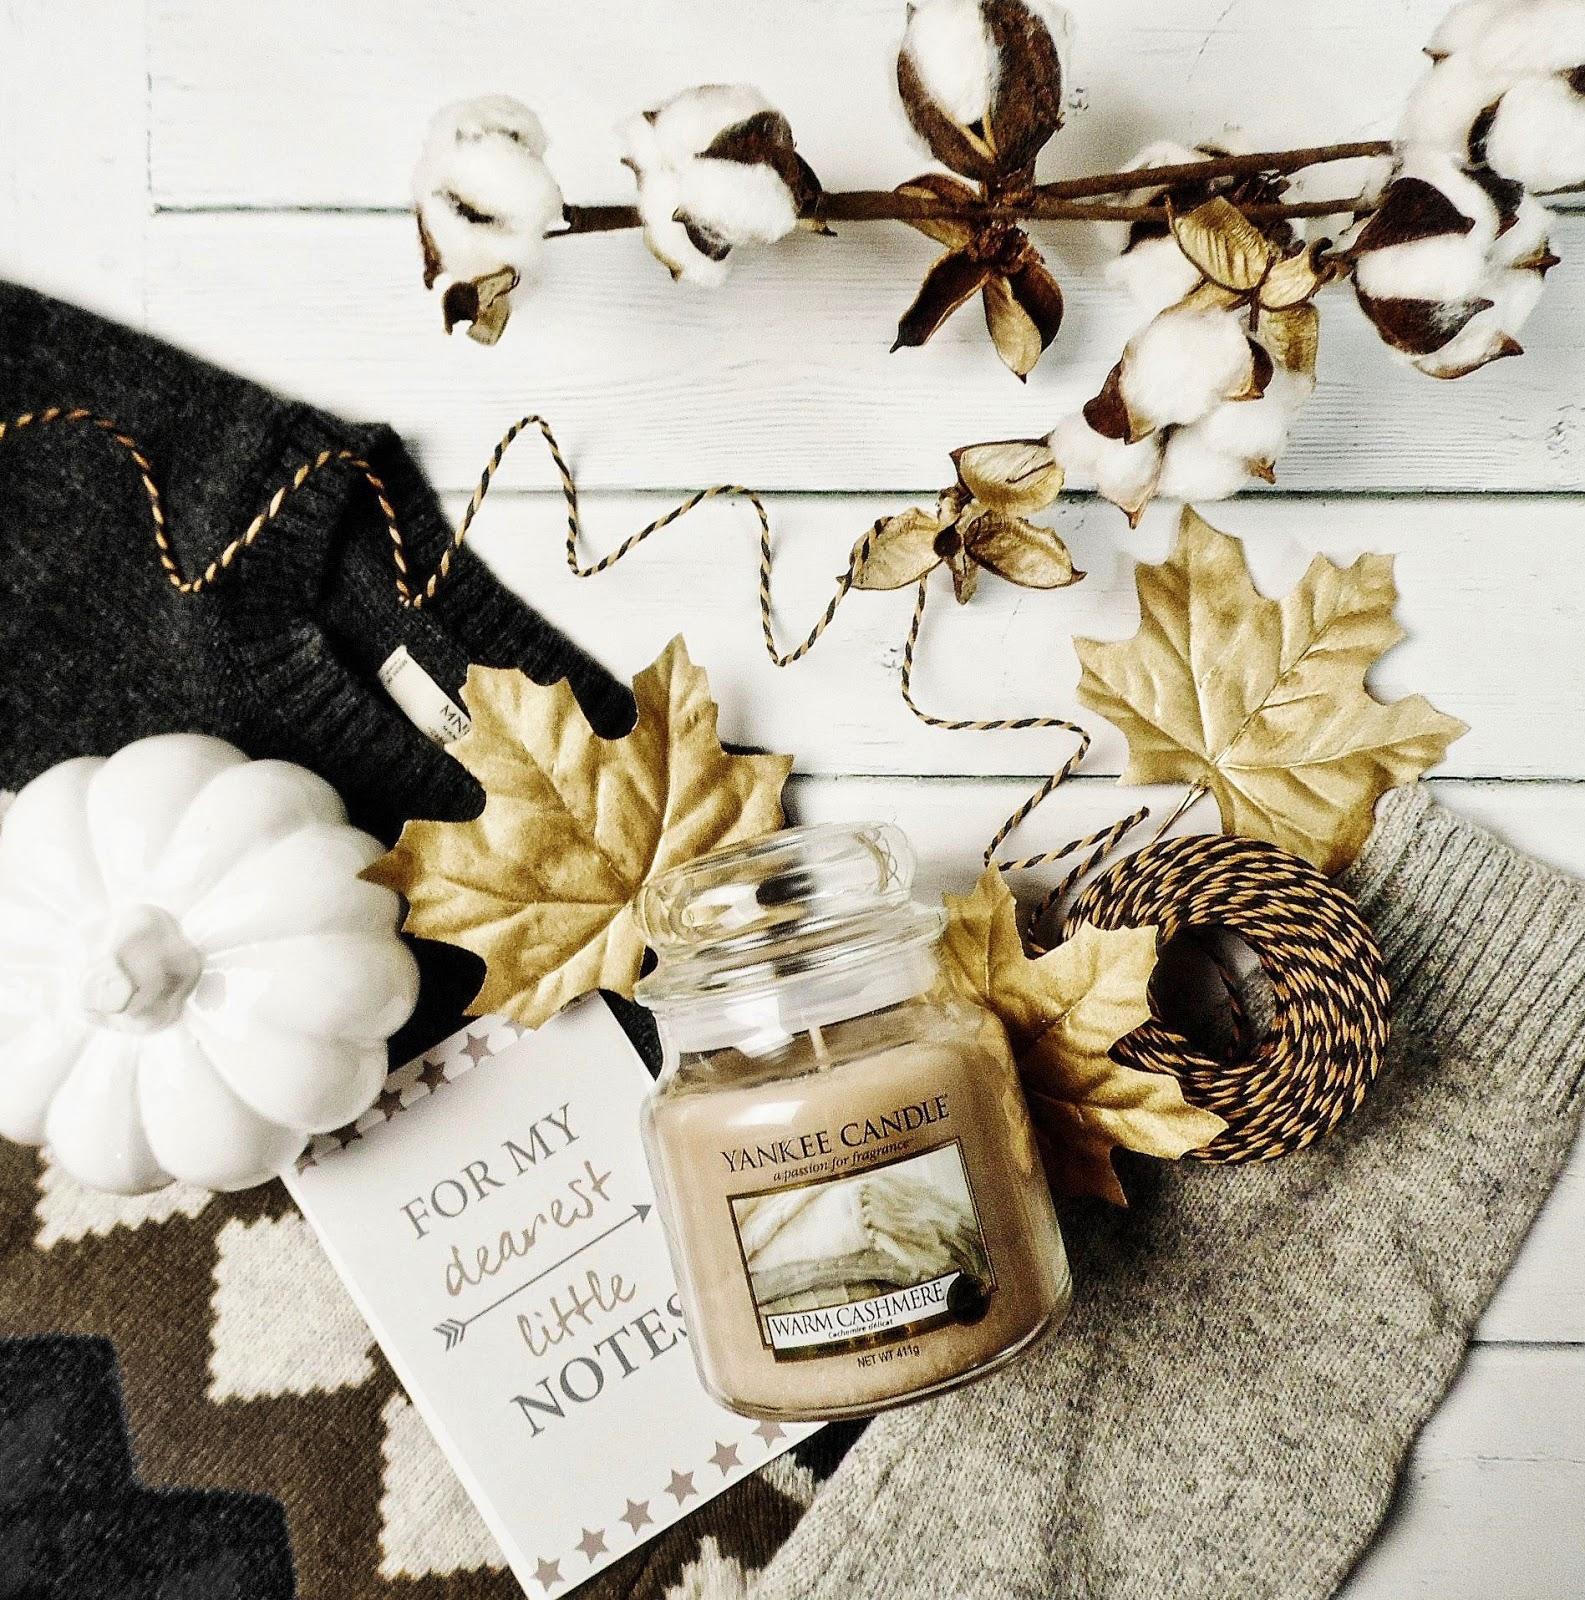 warm cashmere yankee candle jesień 2018 q3